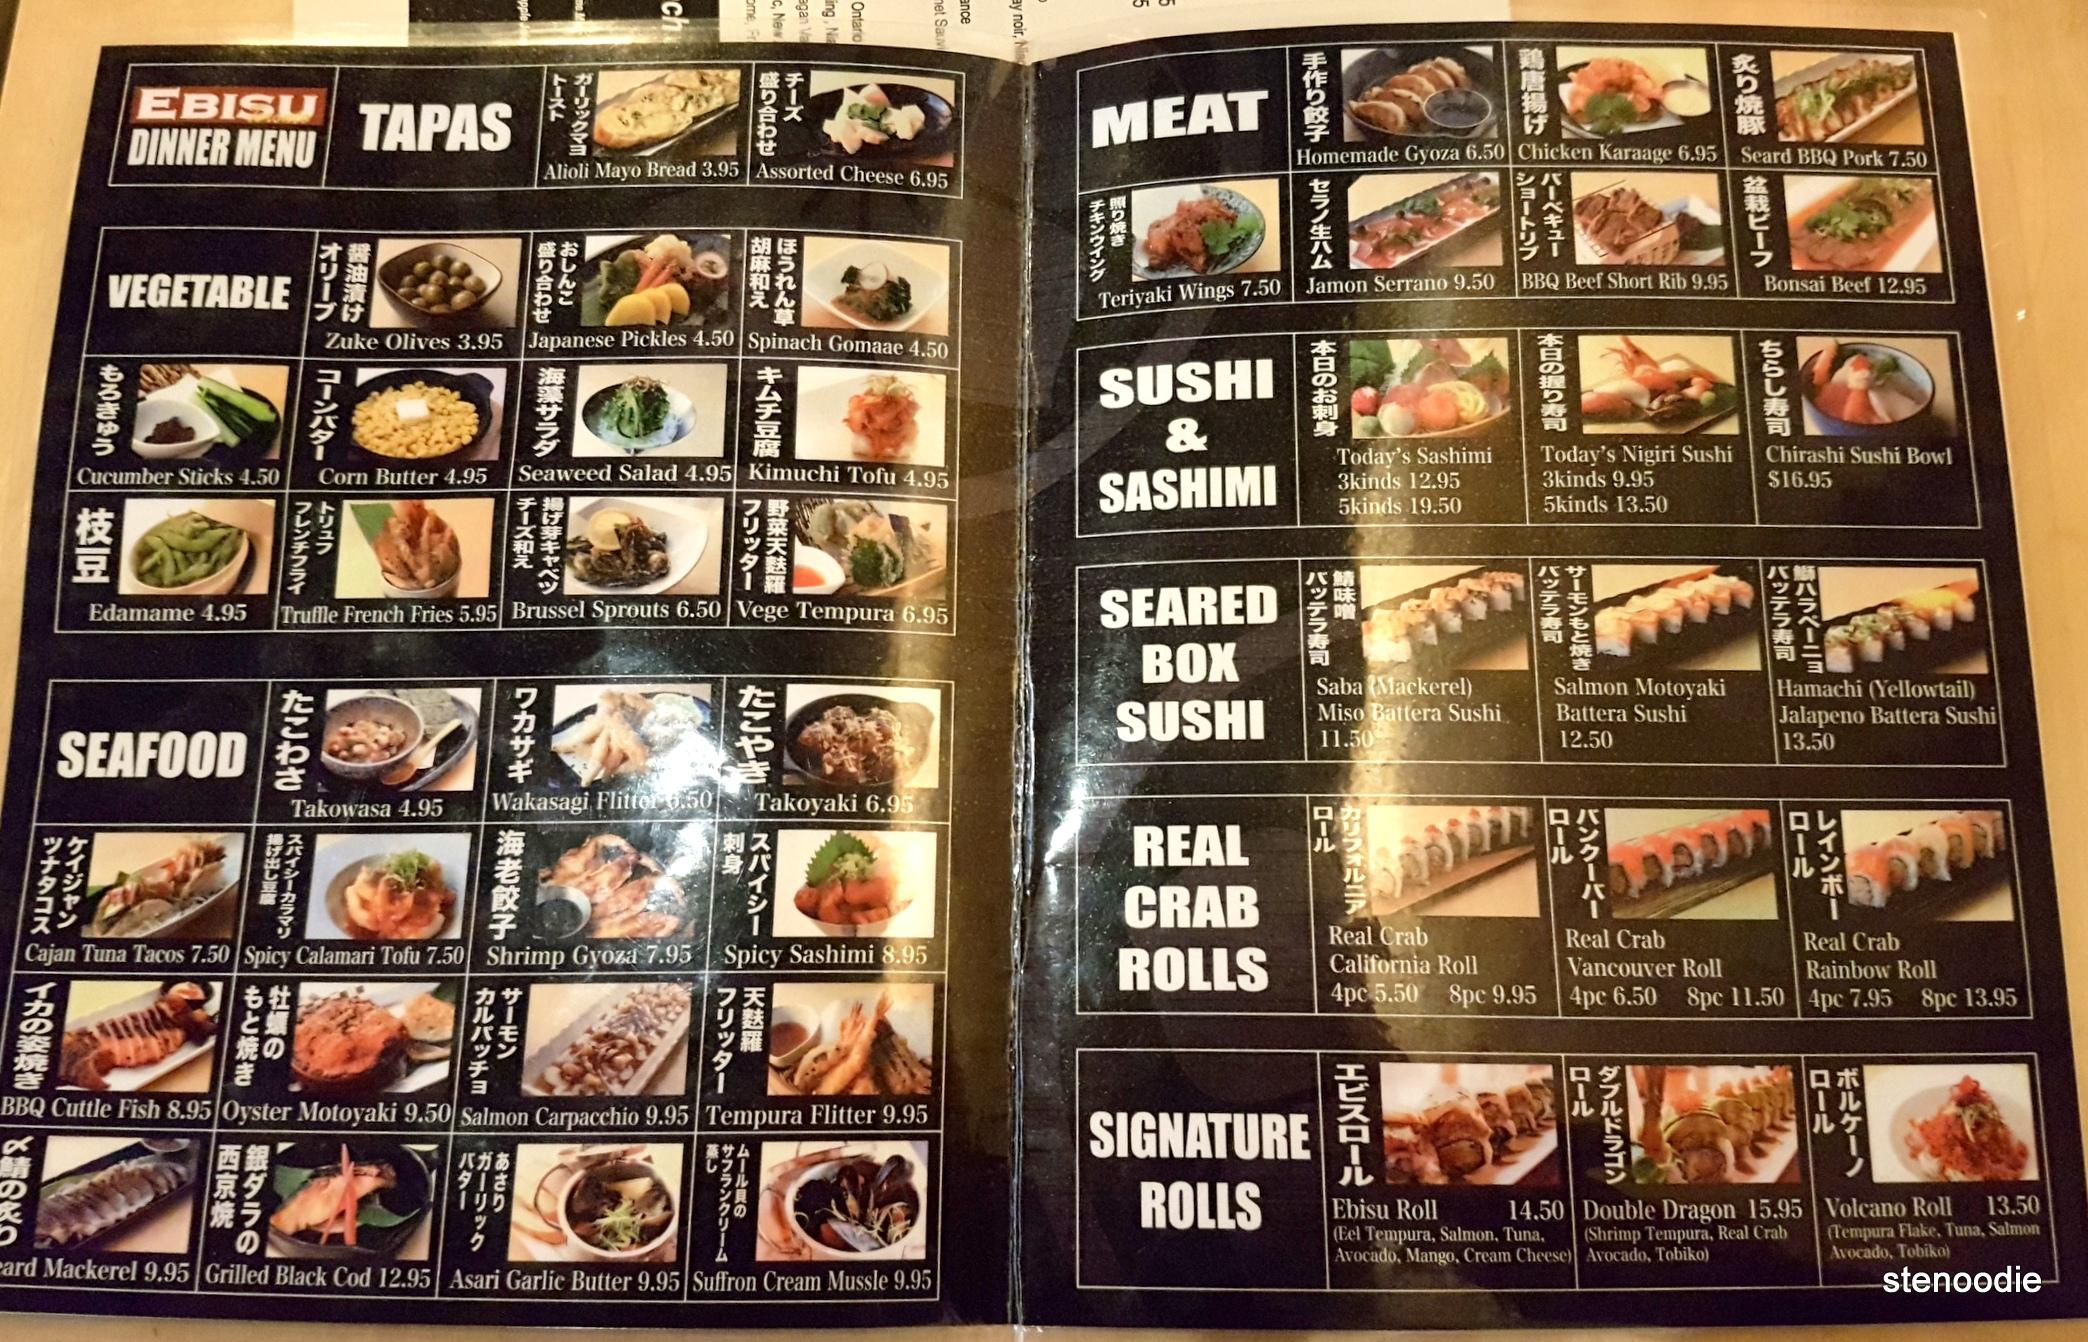 Ebisu tapas and sushi menu and prices